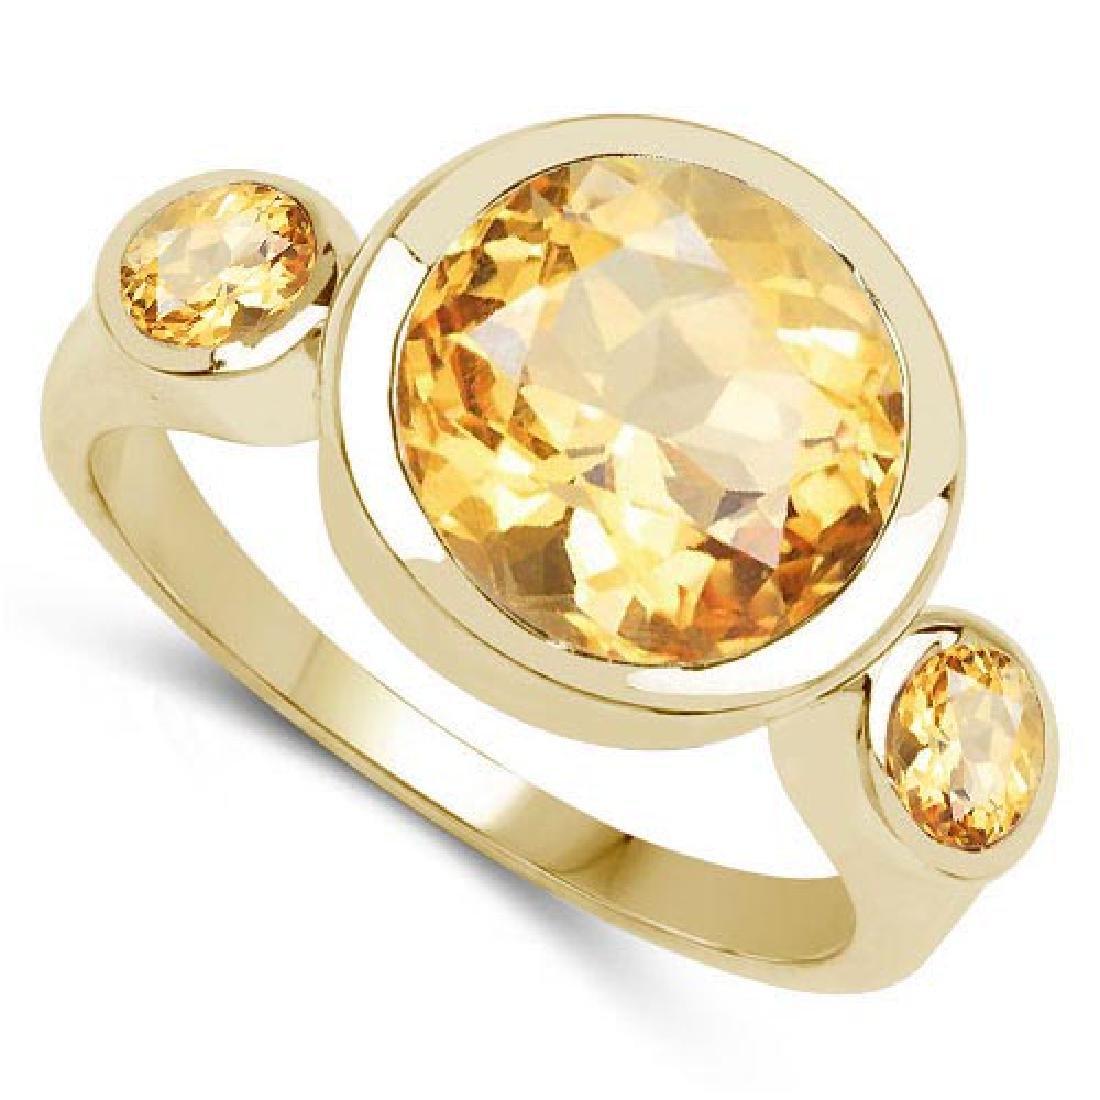 2.60 CTW Genuine Citrine 14K yellow Gold Ring